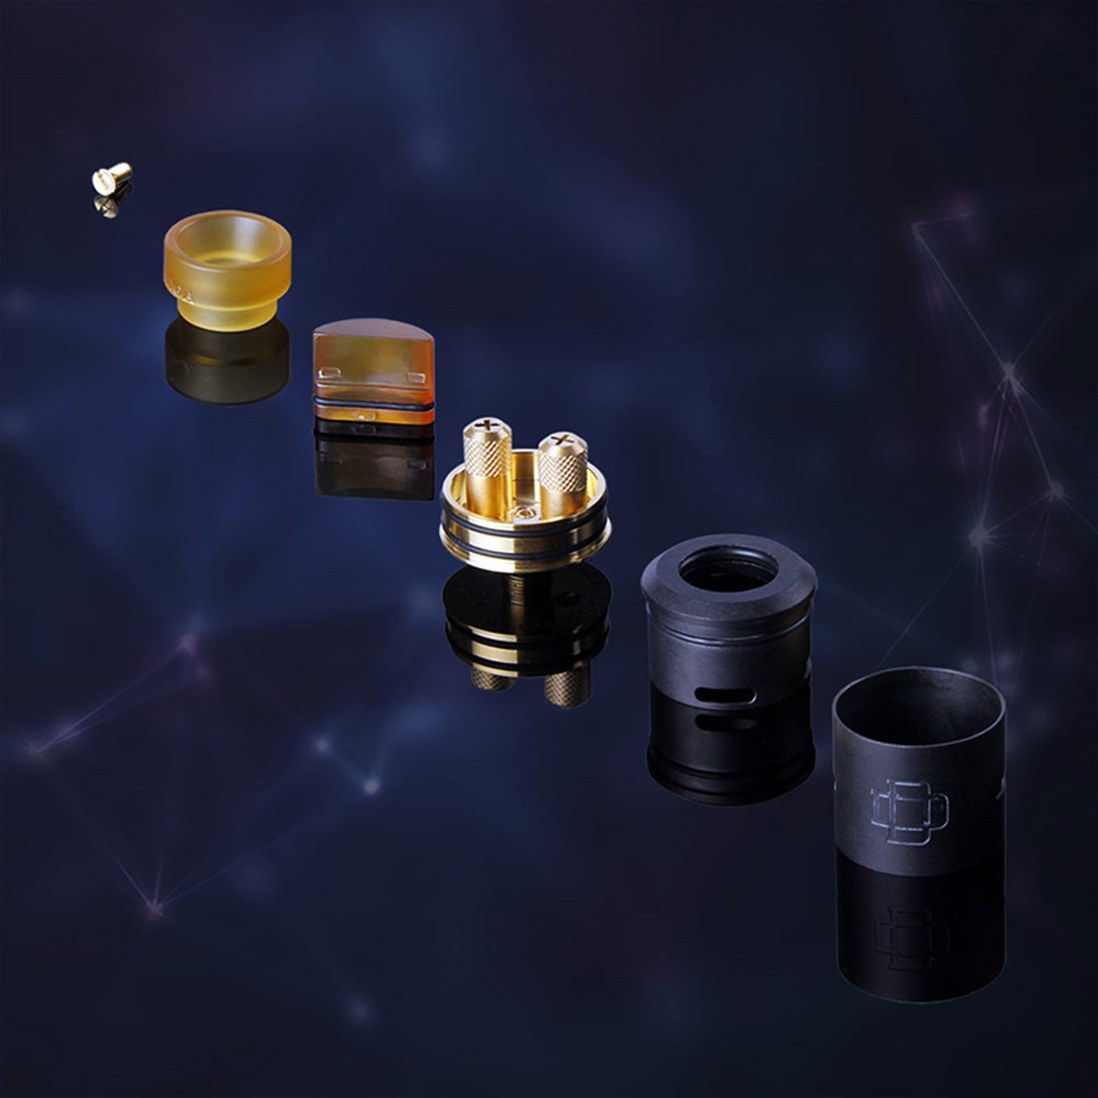 AUGVAPE Druga 22 Squonk Kit Features